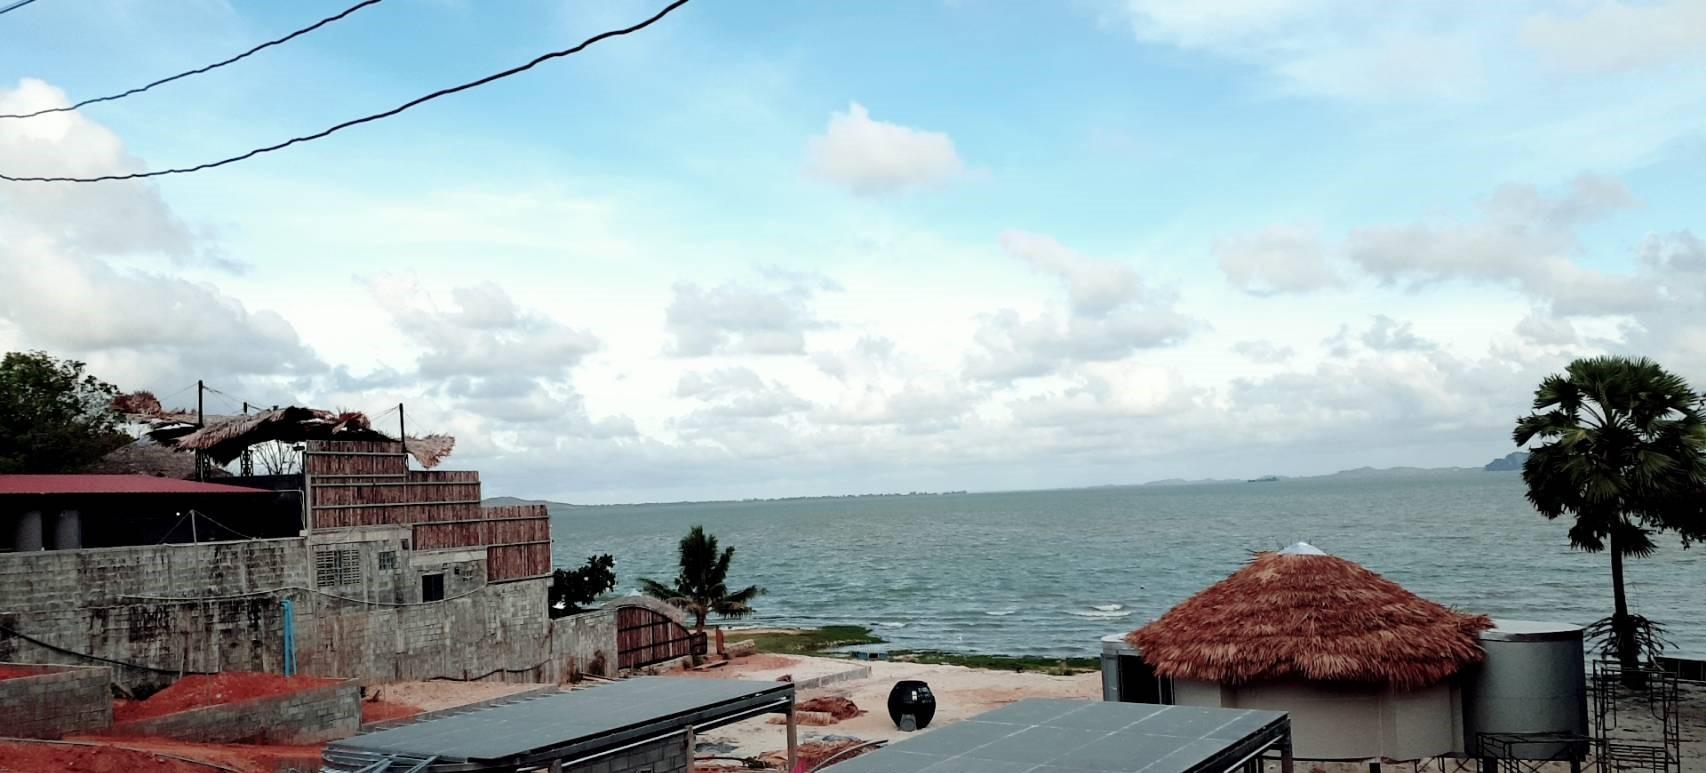 sea view13.jpg